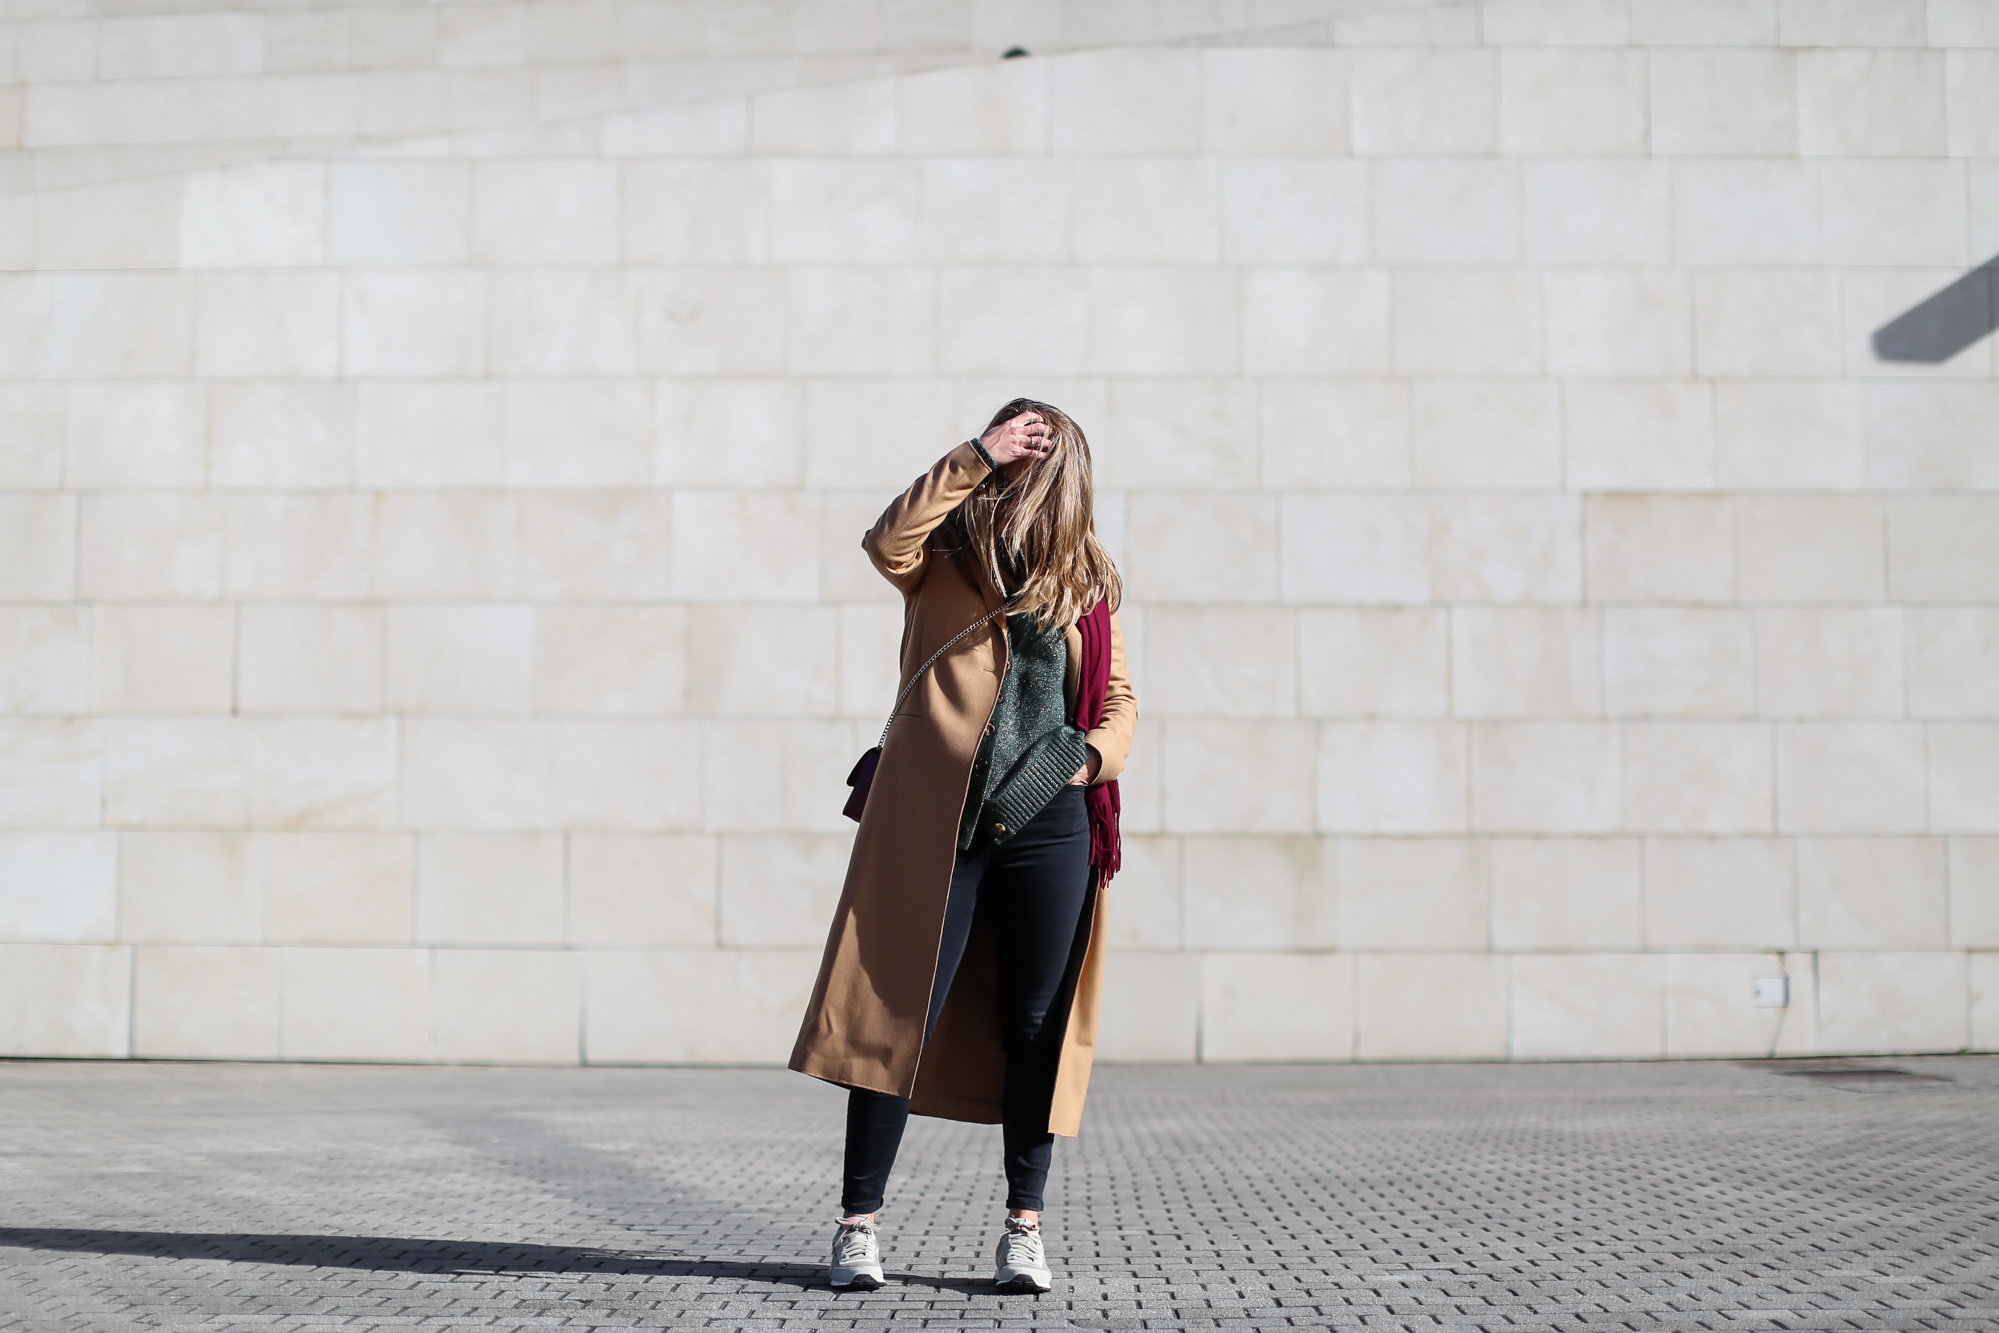 Clochet_streestyle_fashionblogger_&otherstories_abrigocamel_nikepegasus_topshopjamiejeans-4